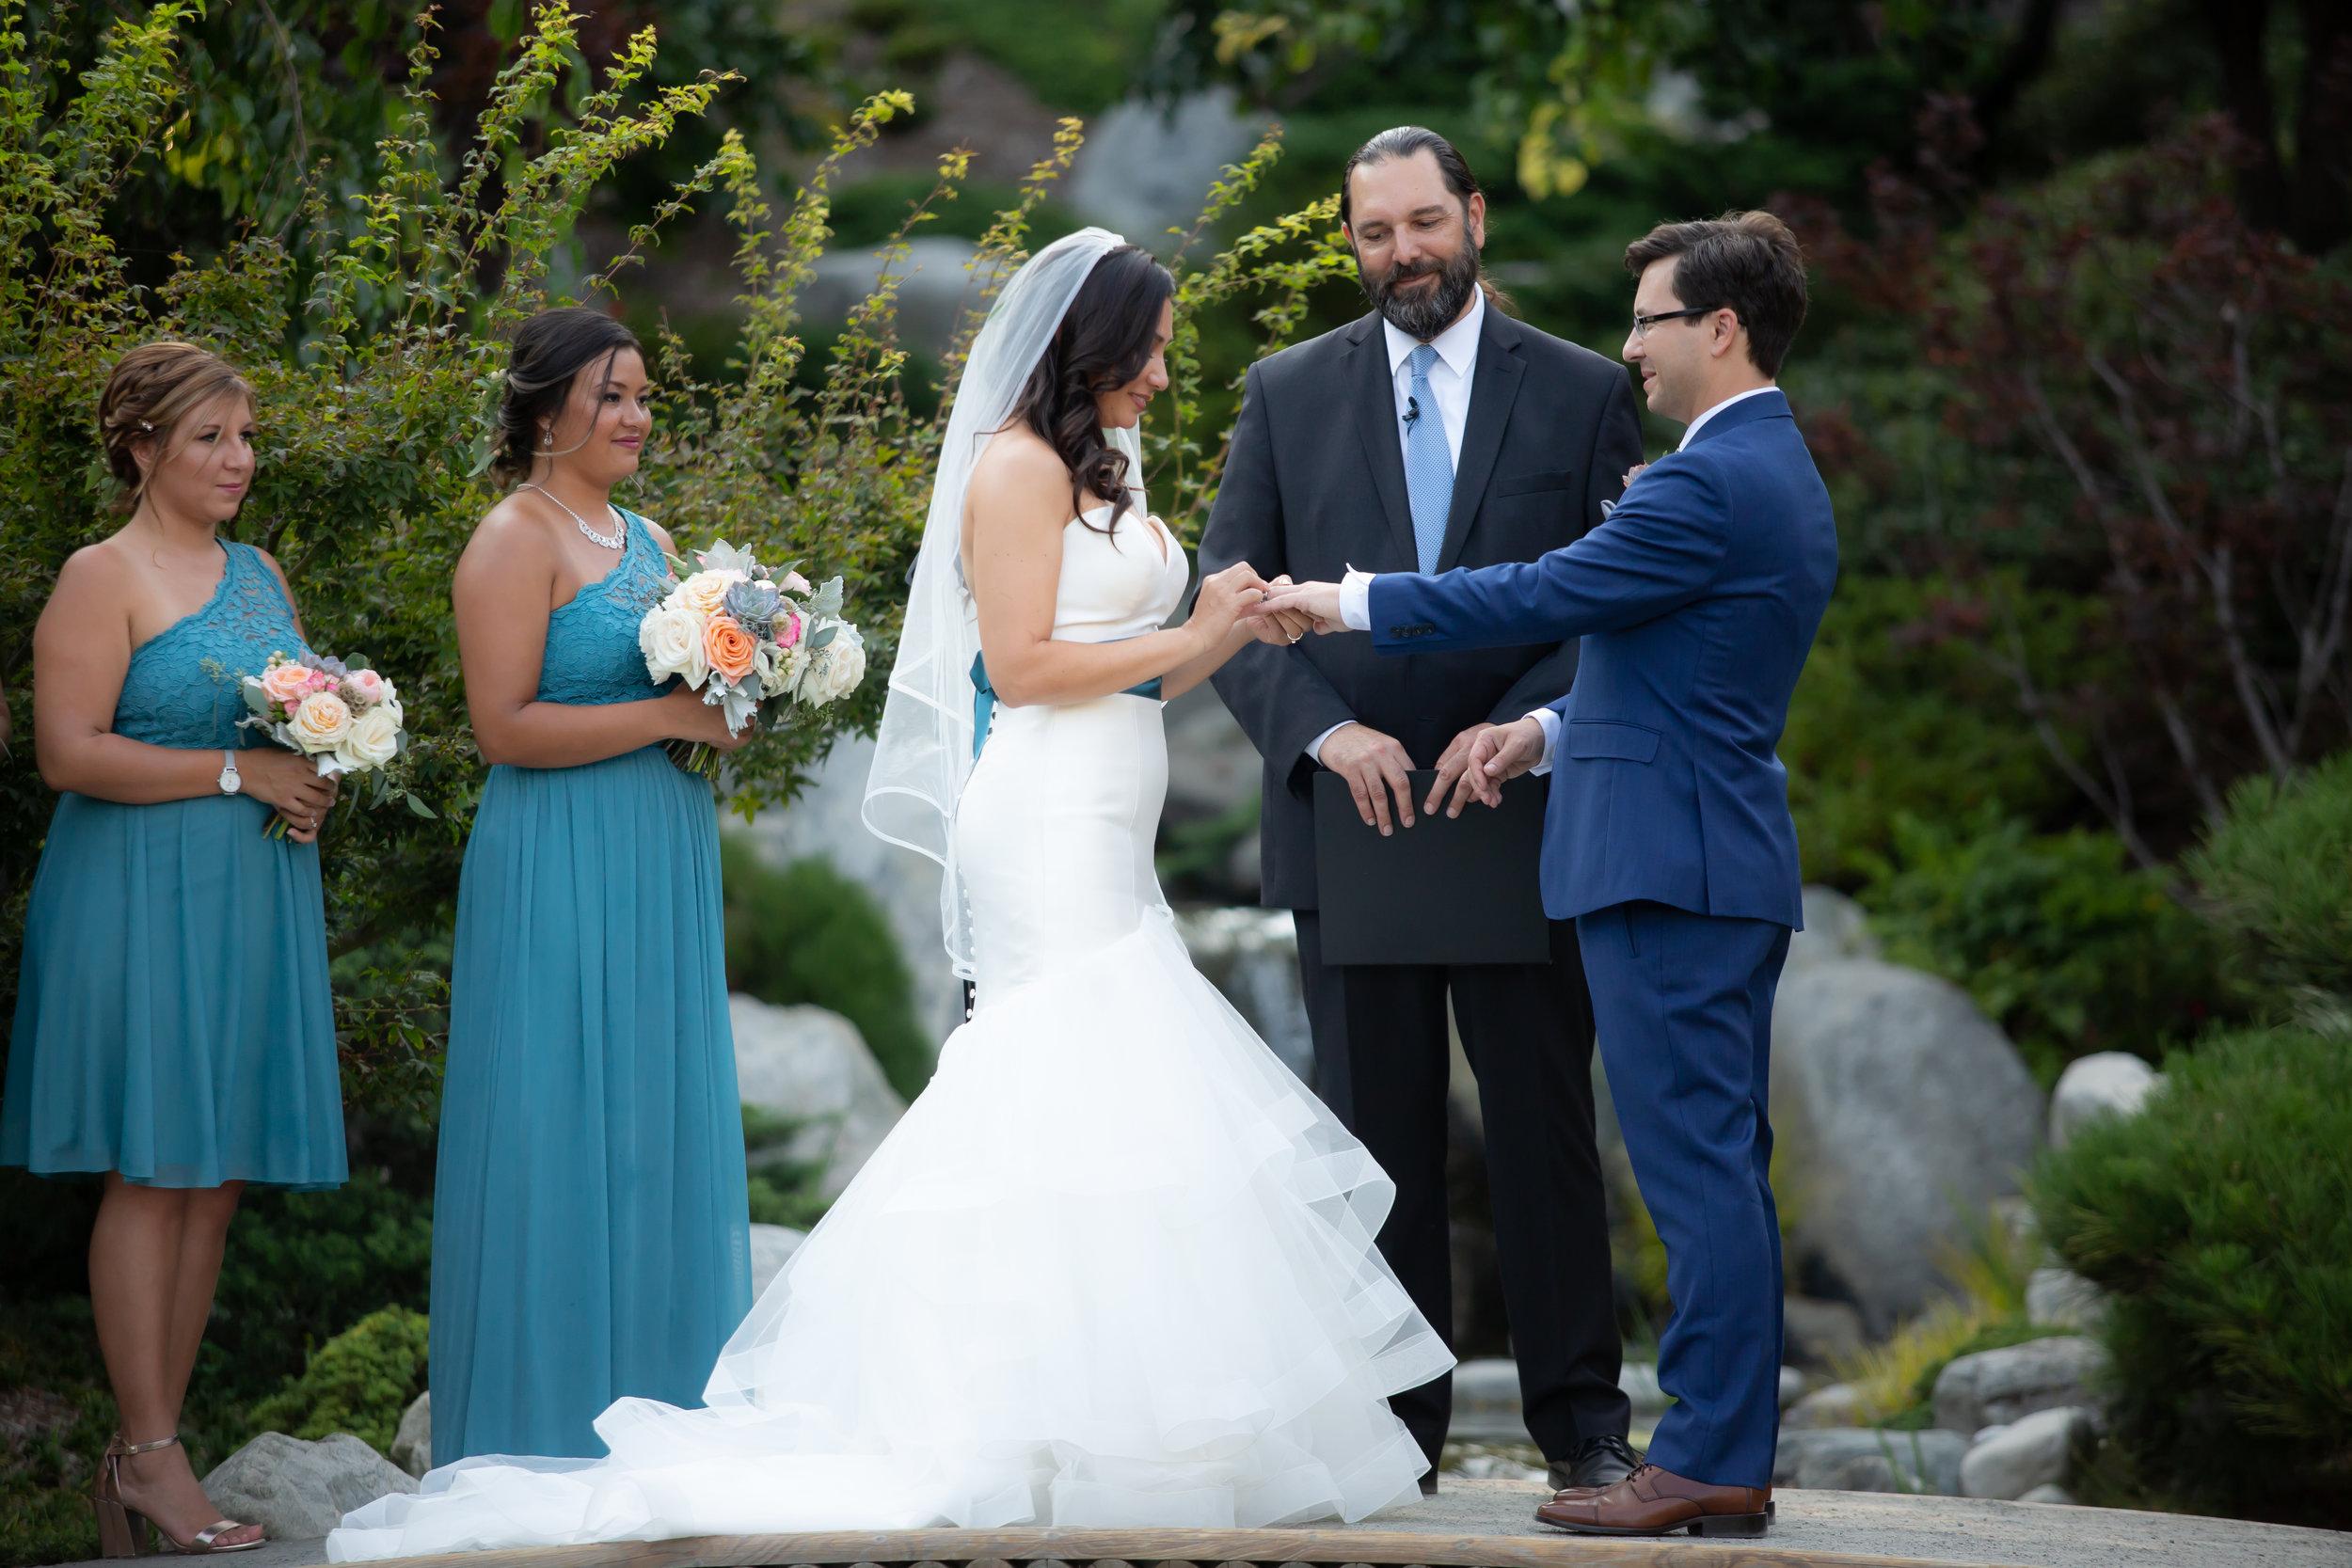 San-Diego-Wedding-Japanese-Friendship-Garden-Carla-David-2018-221.jpg